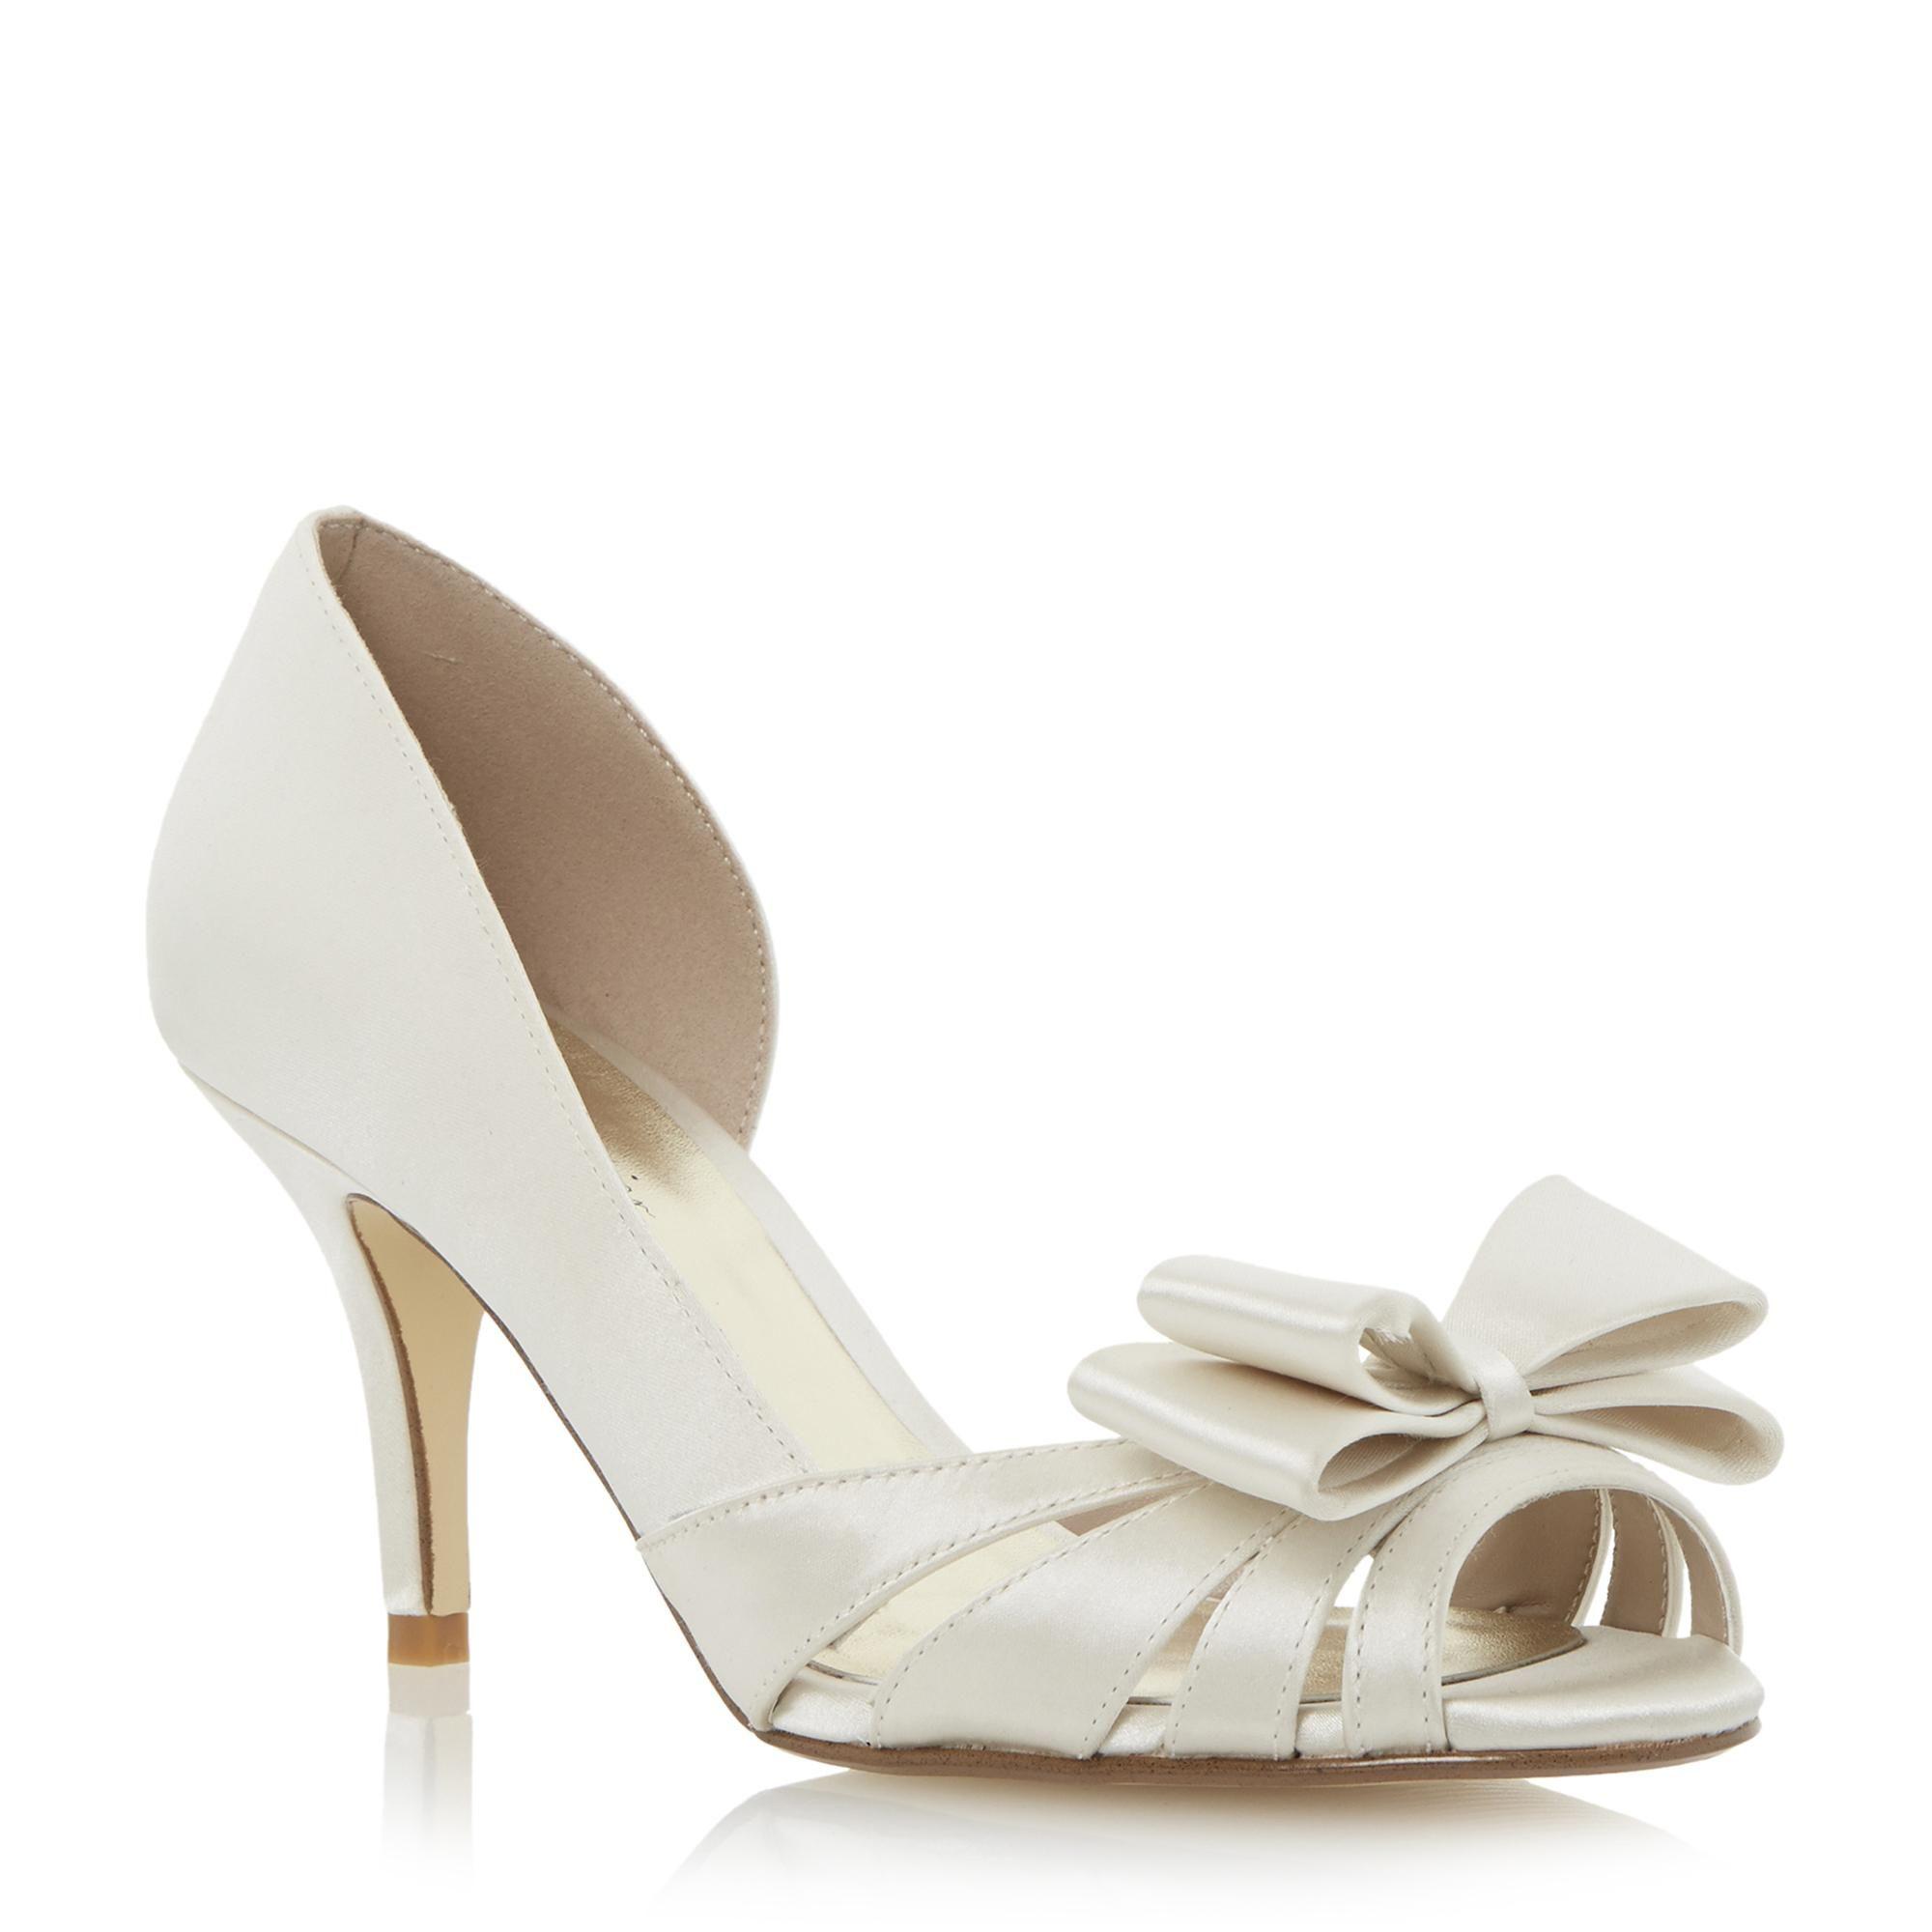 9efc50054c2 Roland Cartier Ladies DELOMA - Bow Trim Semi D Orsay Court Shoe - ivory